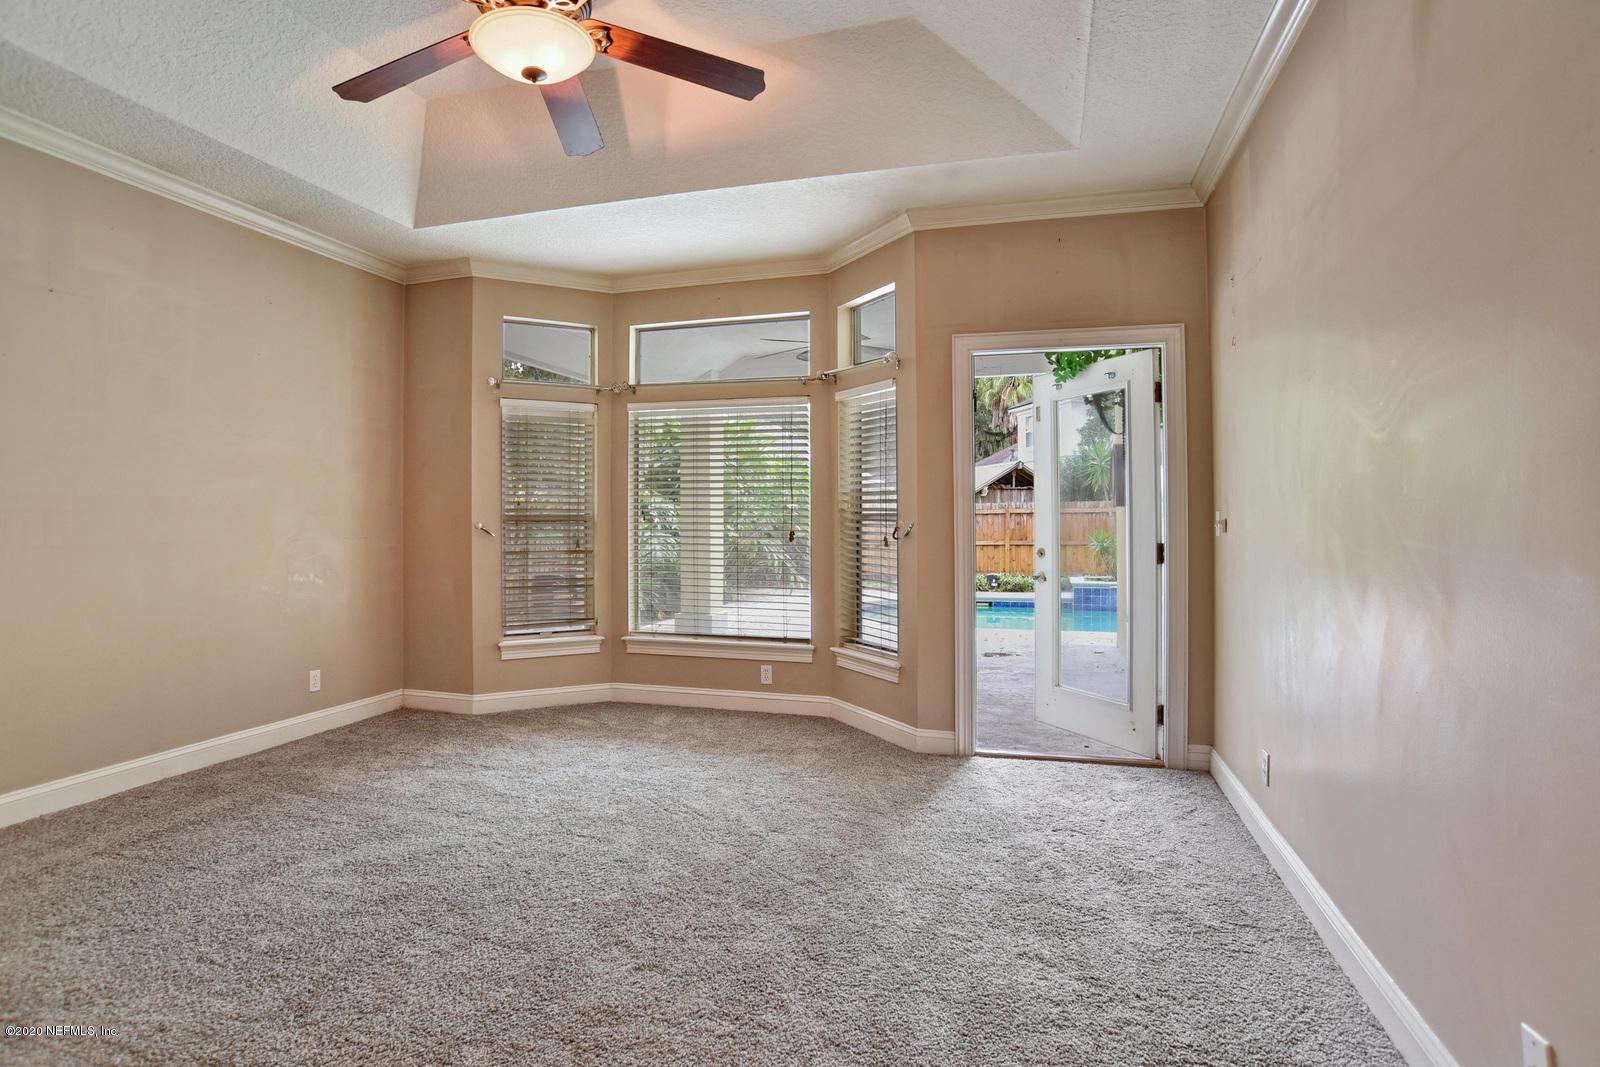 41 TALLWOOD, JACKSONVILLE BEACH, FLORIDA 32250, 3 Bedrooms Bedrooms, ,2 BathroomsBathrooms,Residential,For sale,TALLWOOD,1082880